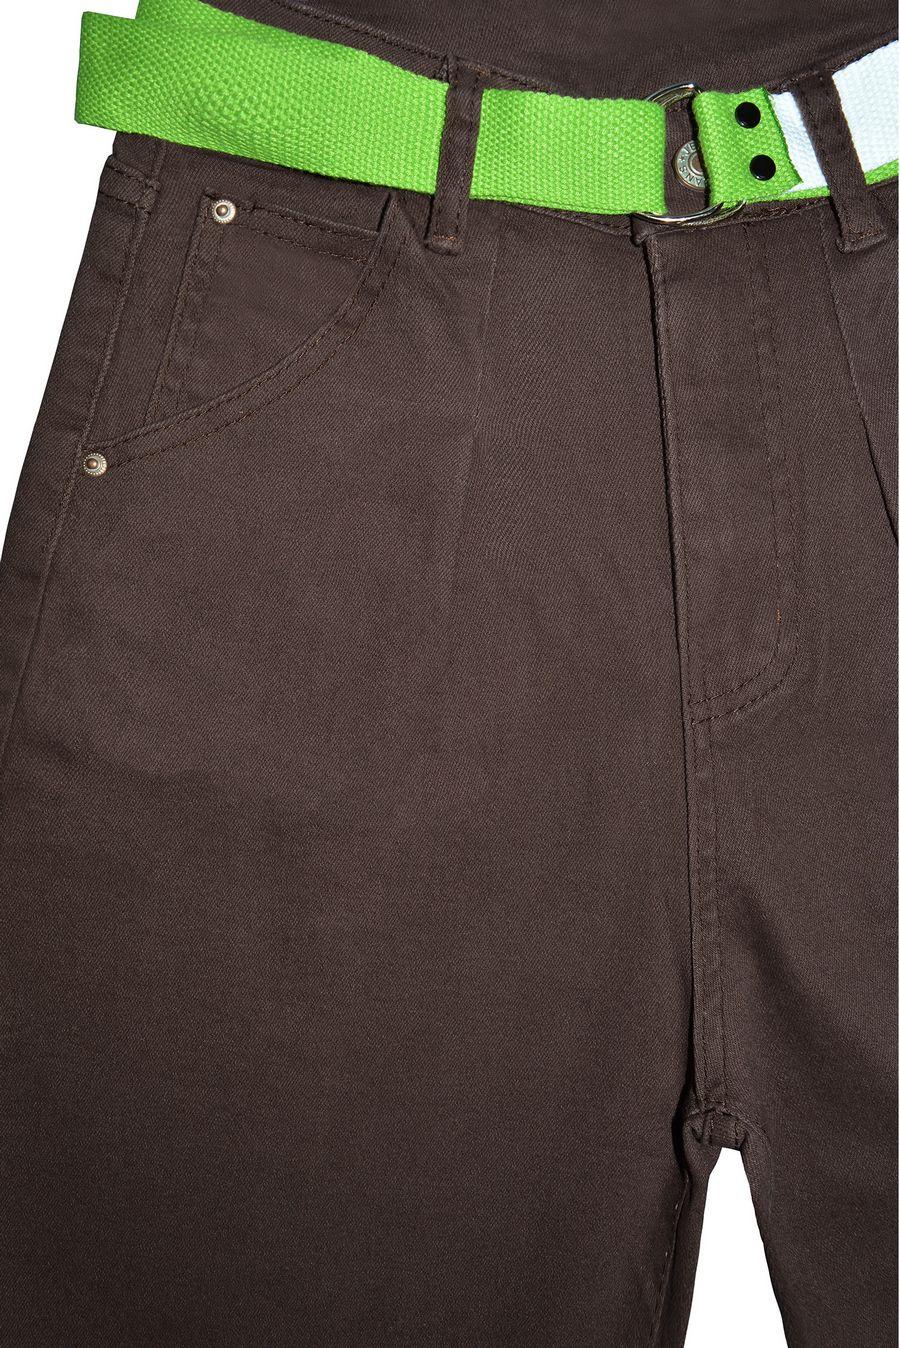 Брюки женские K.Y Jeans 5707 - фото 3